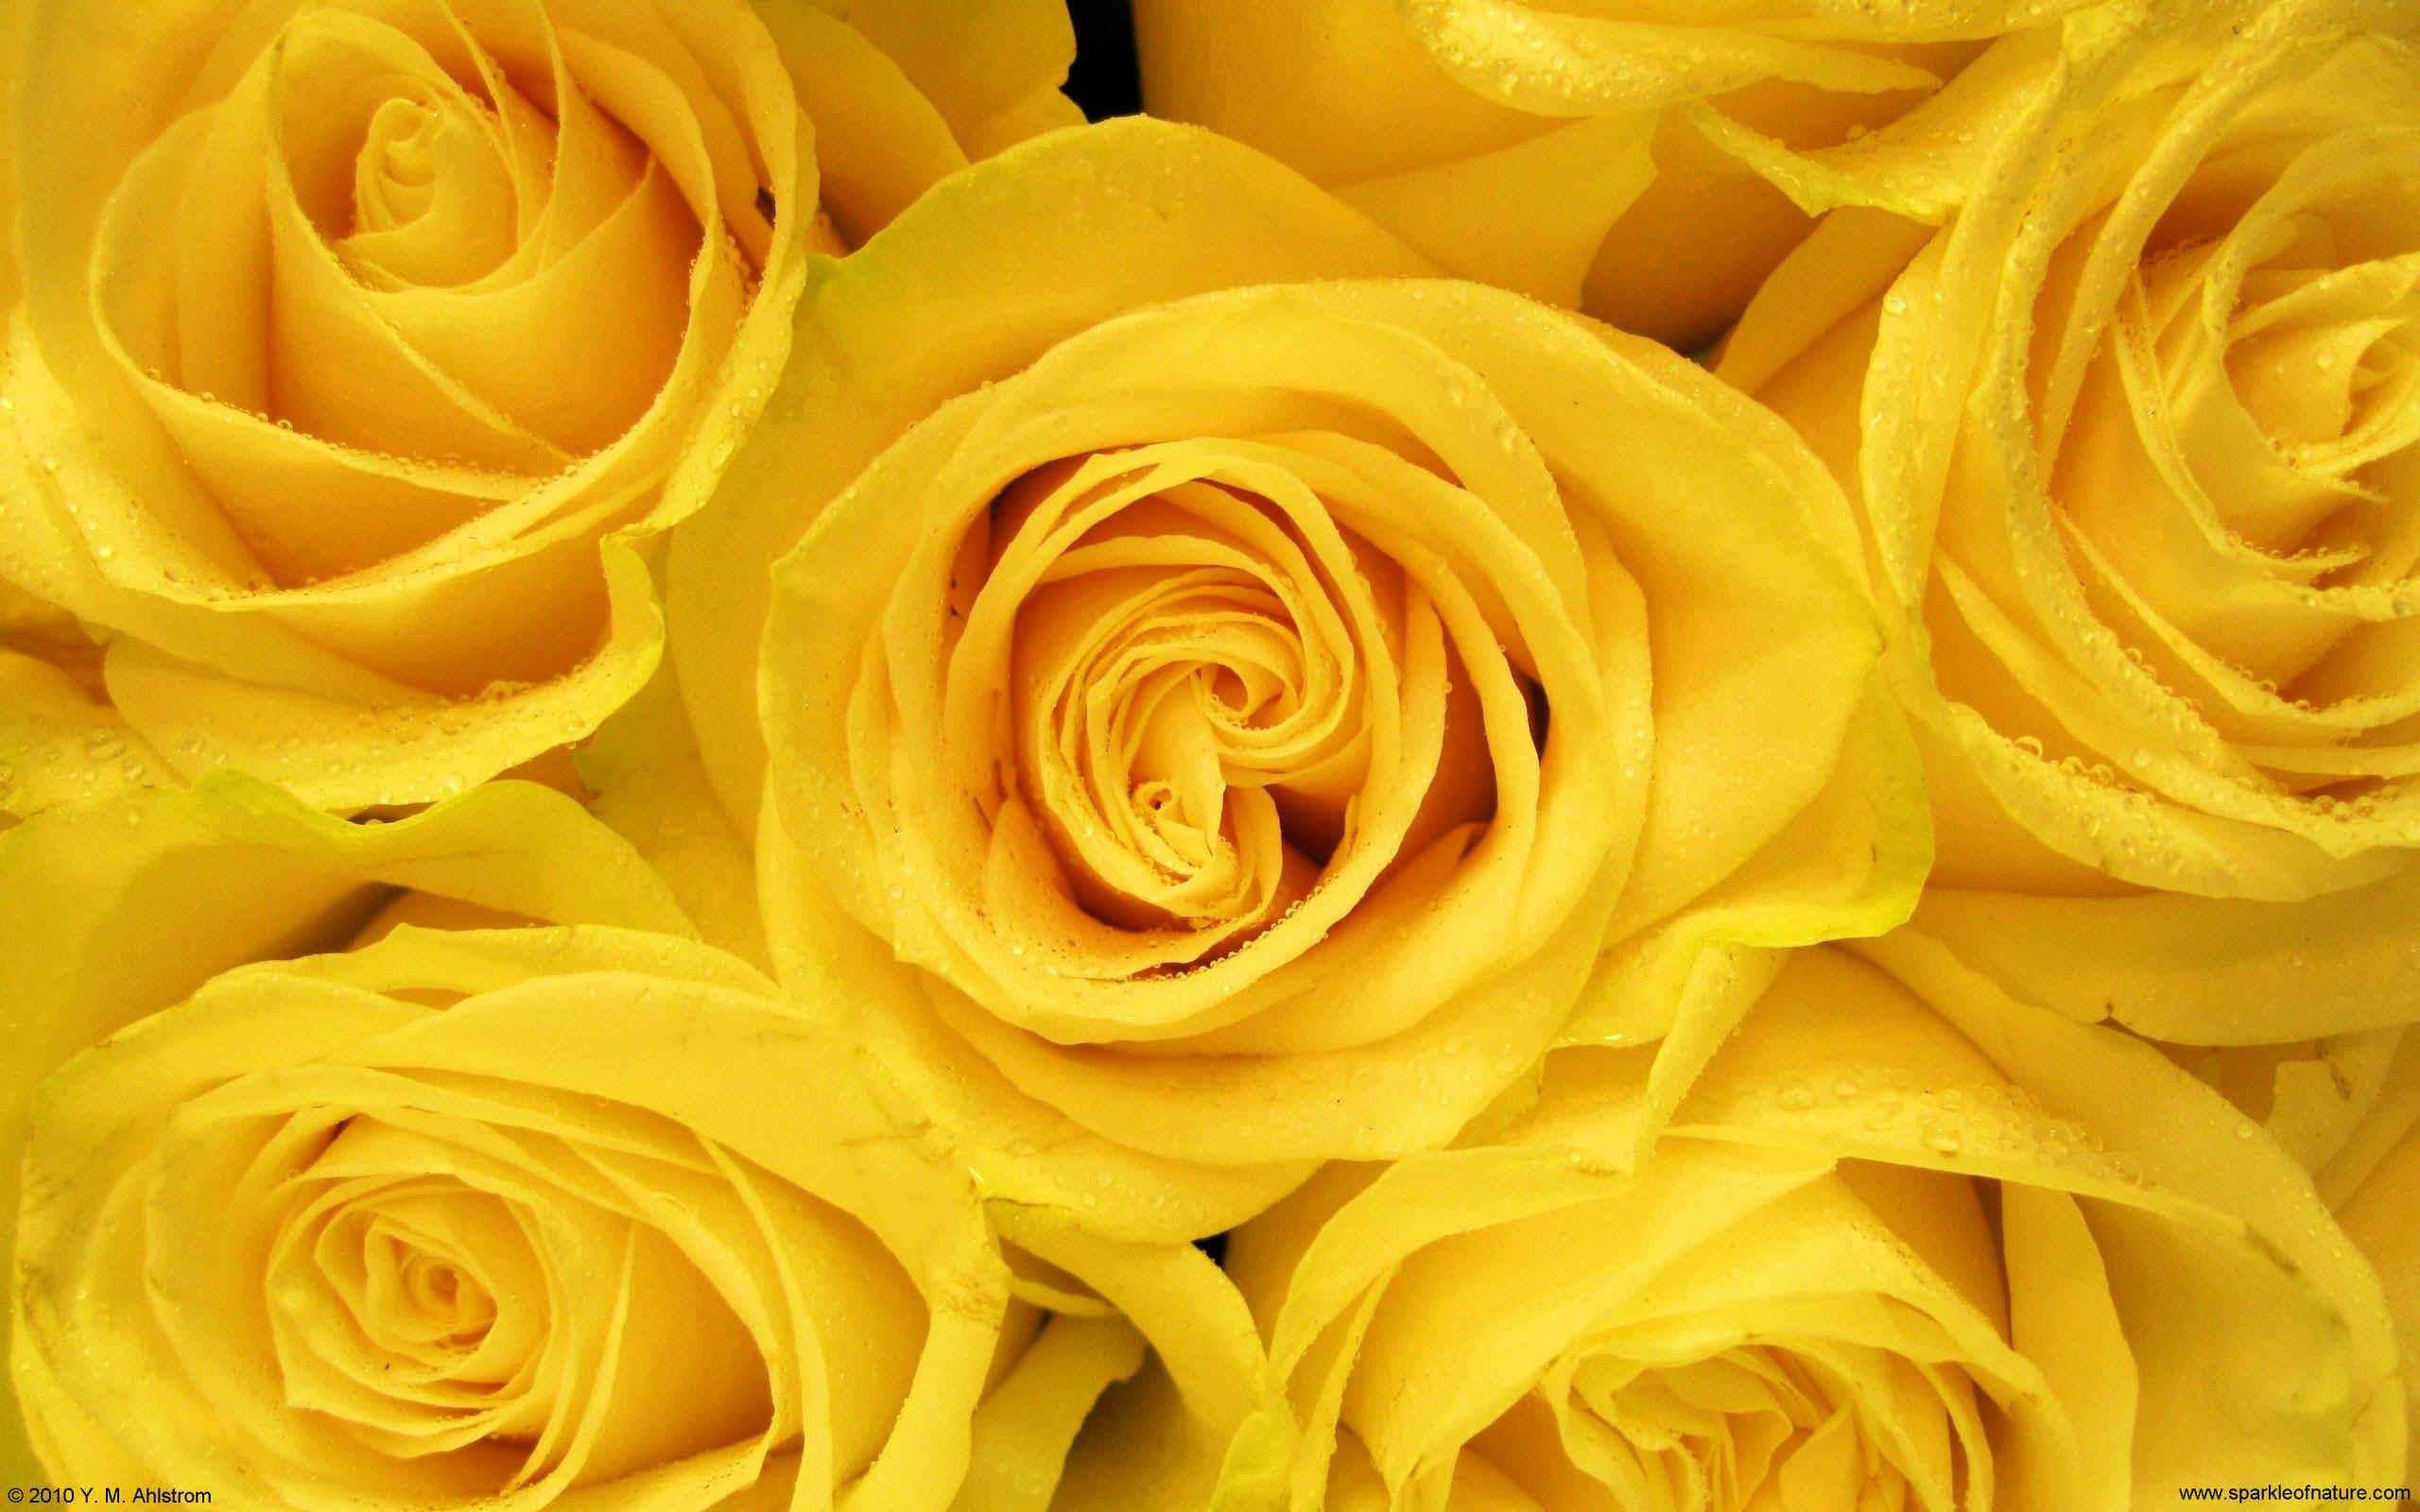 Hd wallpaper yellow flowers - Yellow Roses Wallpaper